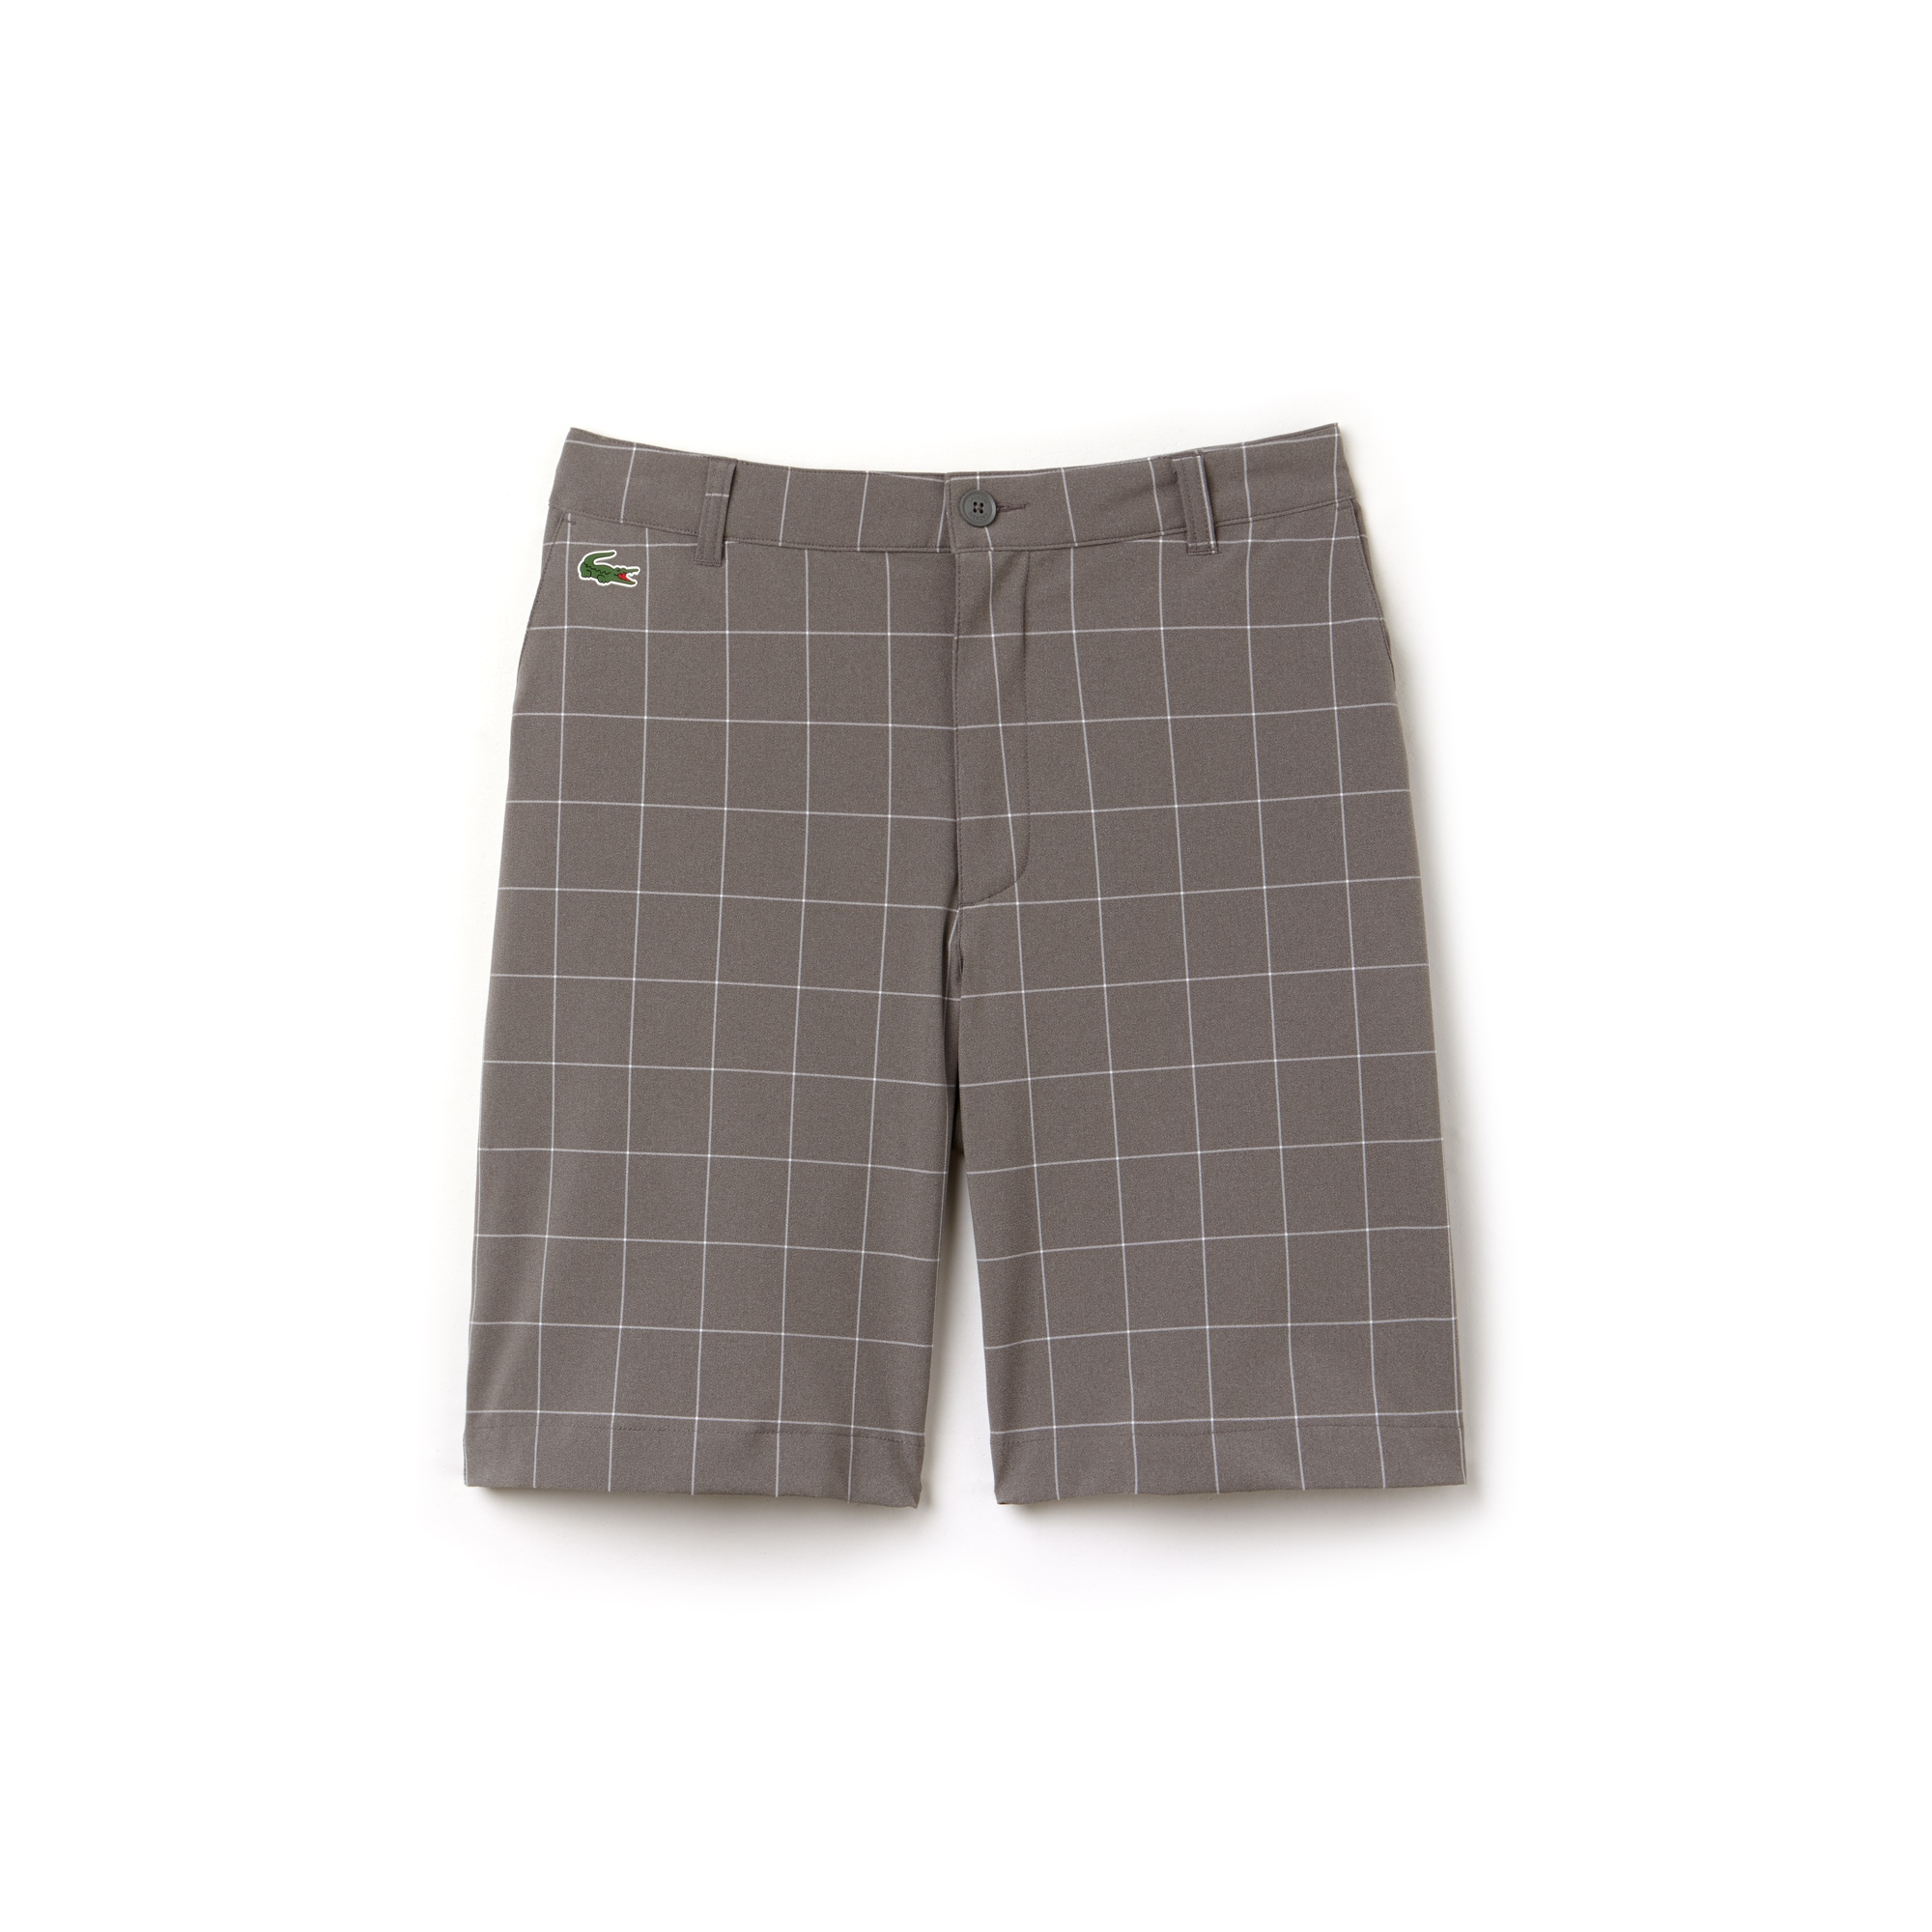 Men's Lacoste SPORT Net Print Technical Golf Bermuda Shorts